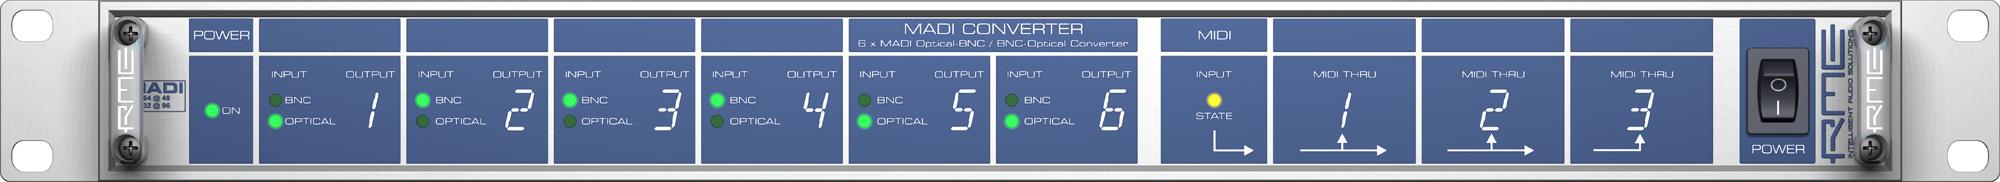 RME MADI Converter Front Panel